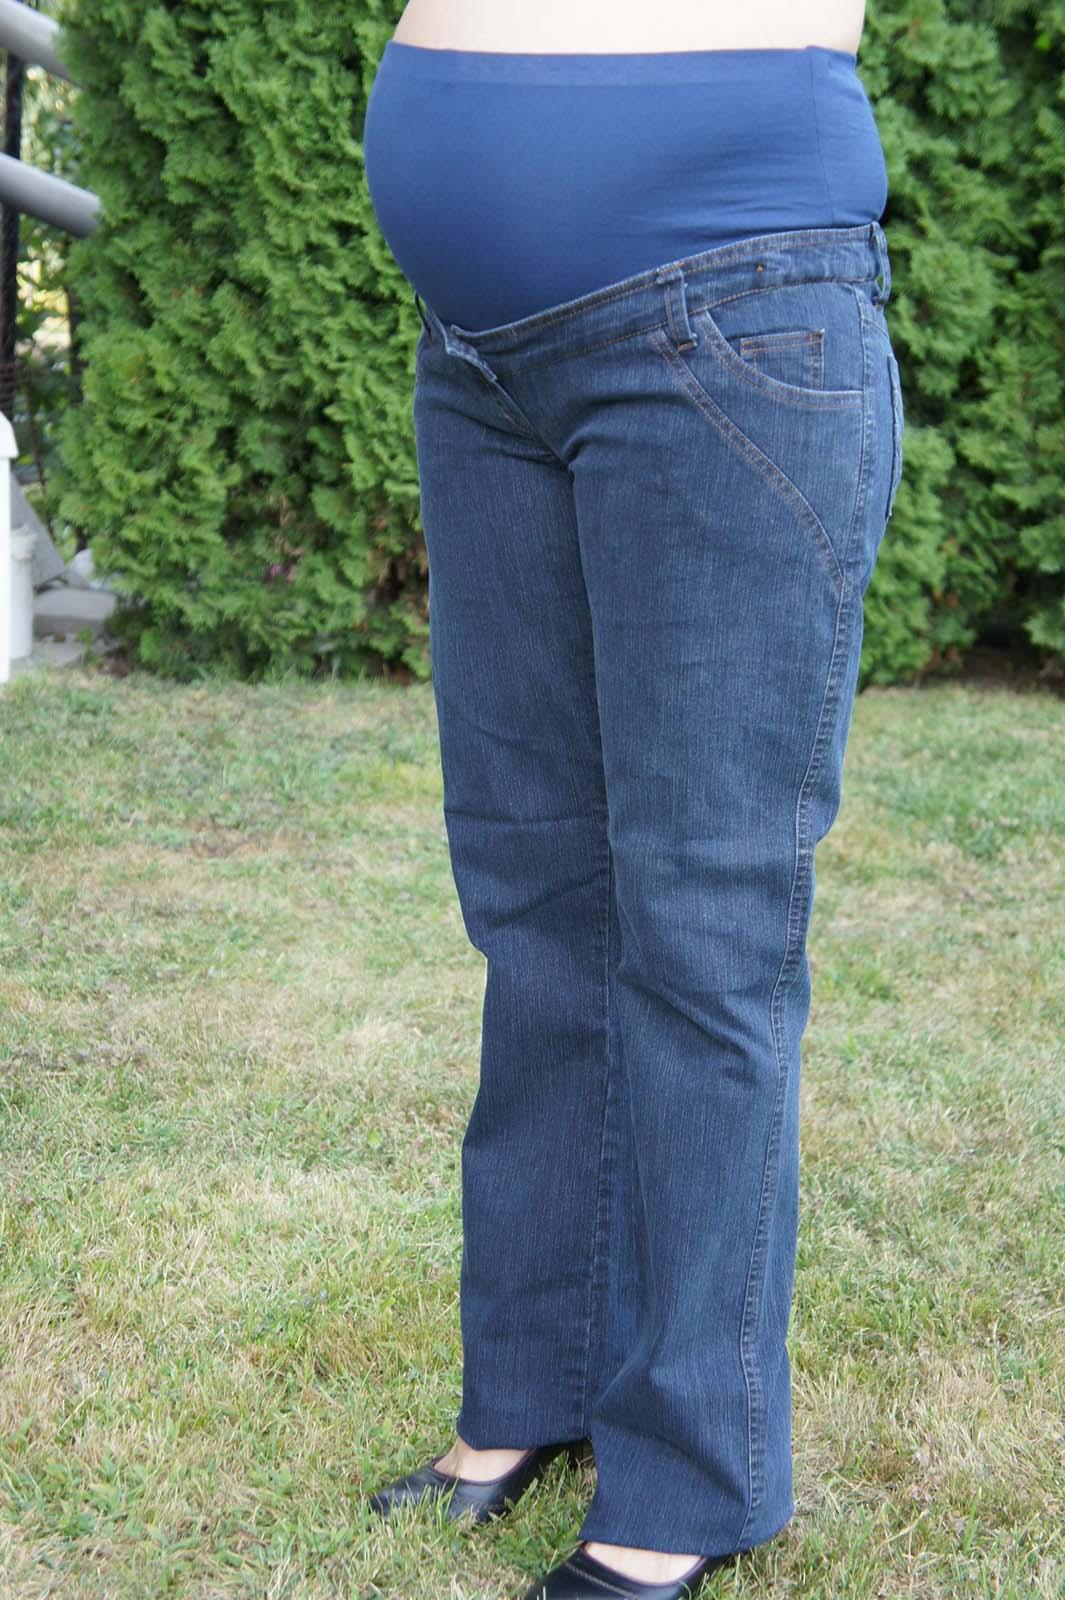 cae8f60bd0 Mommy Style egyenes szárú kismama farmer nadrág